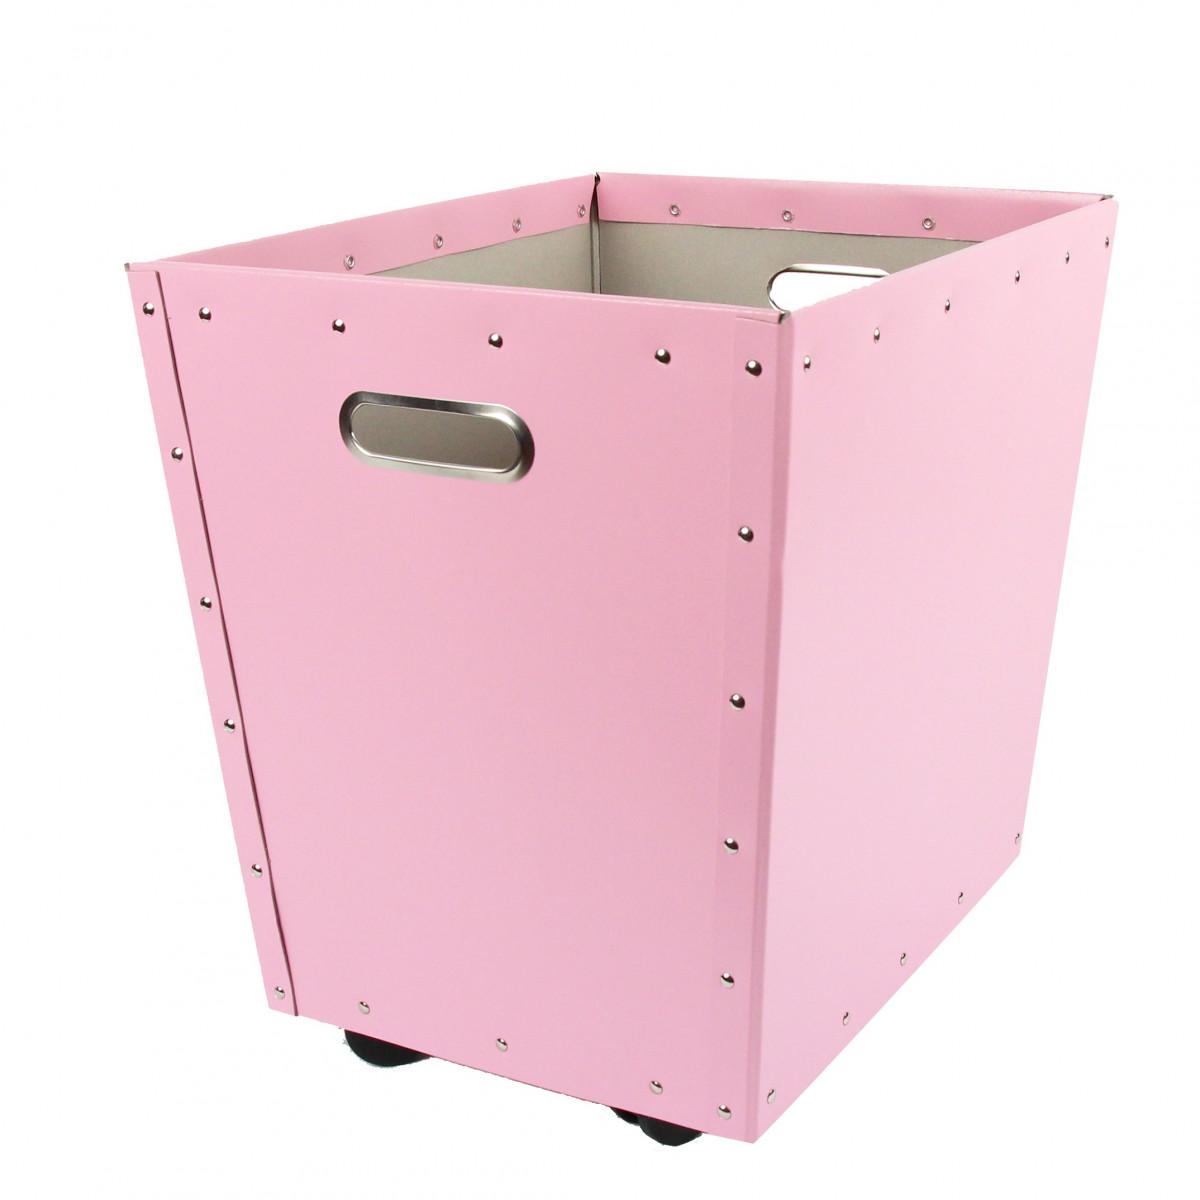 bac de rangement roulettes en carton rose. Black Bedroom Furniture Sets. Home Design Ideas